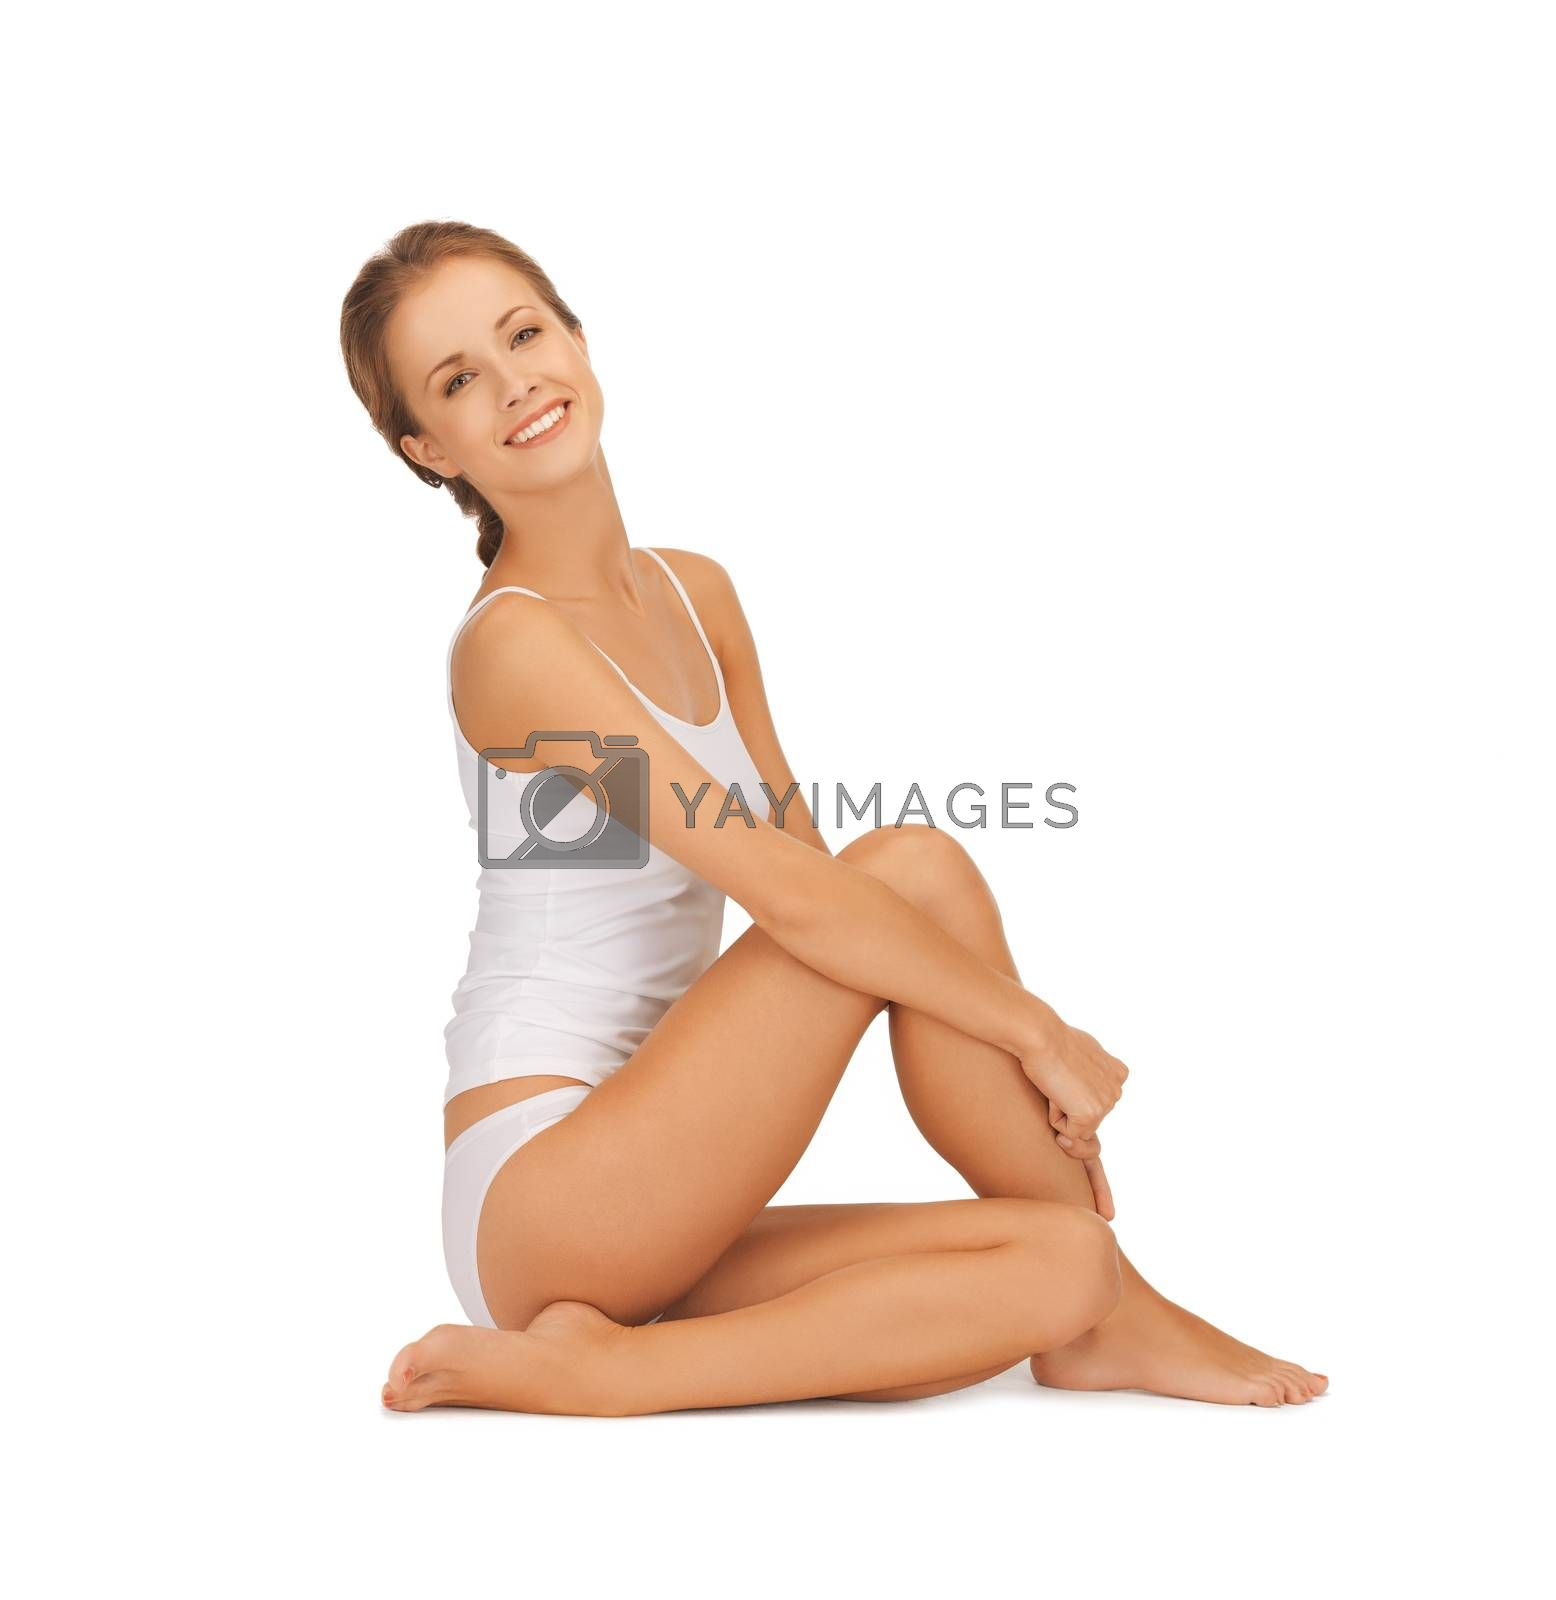 beautiful woman in white cotton underwear by dolgachov